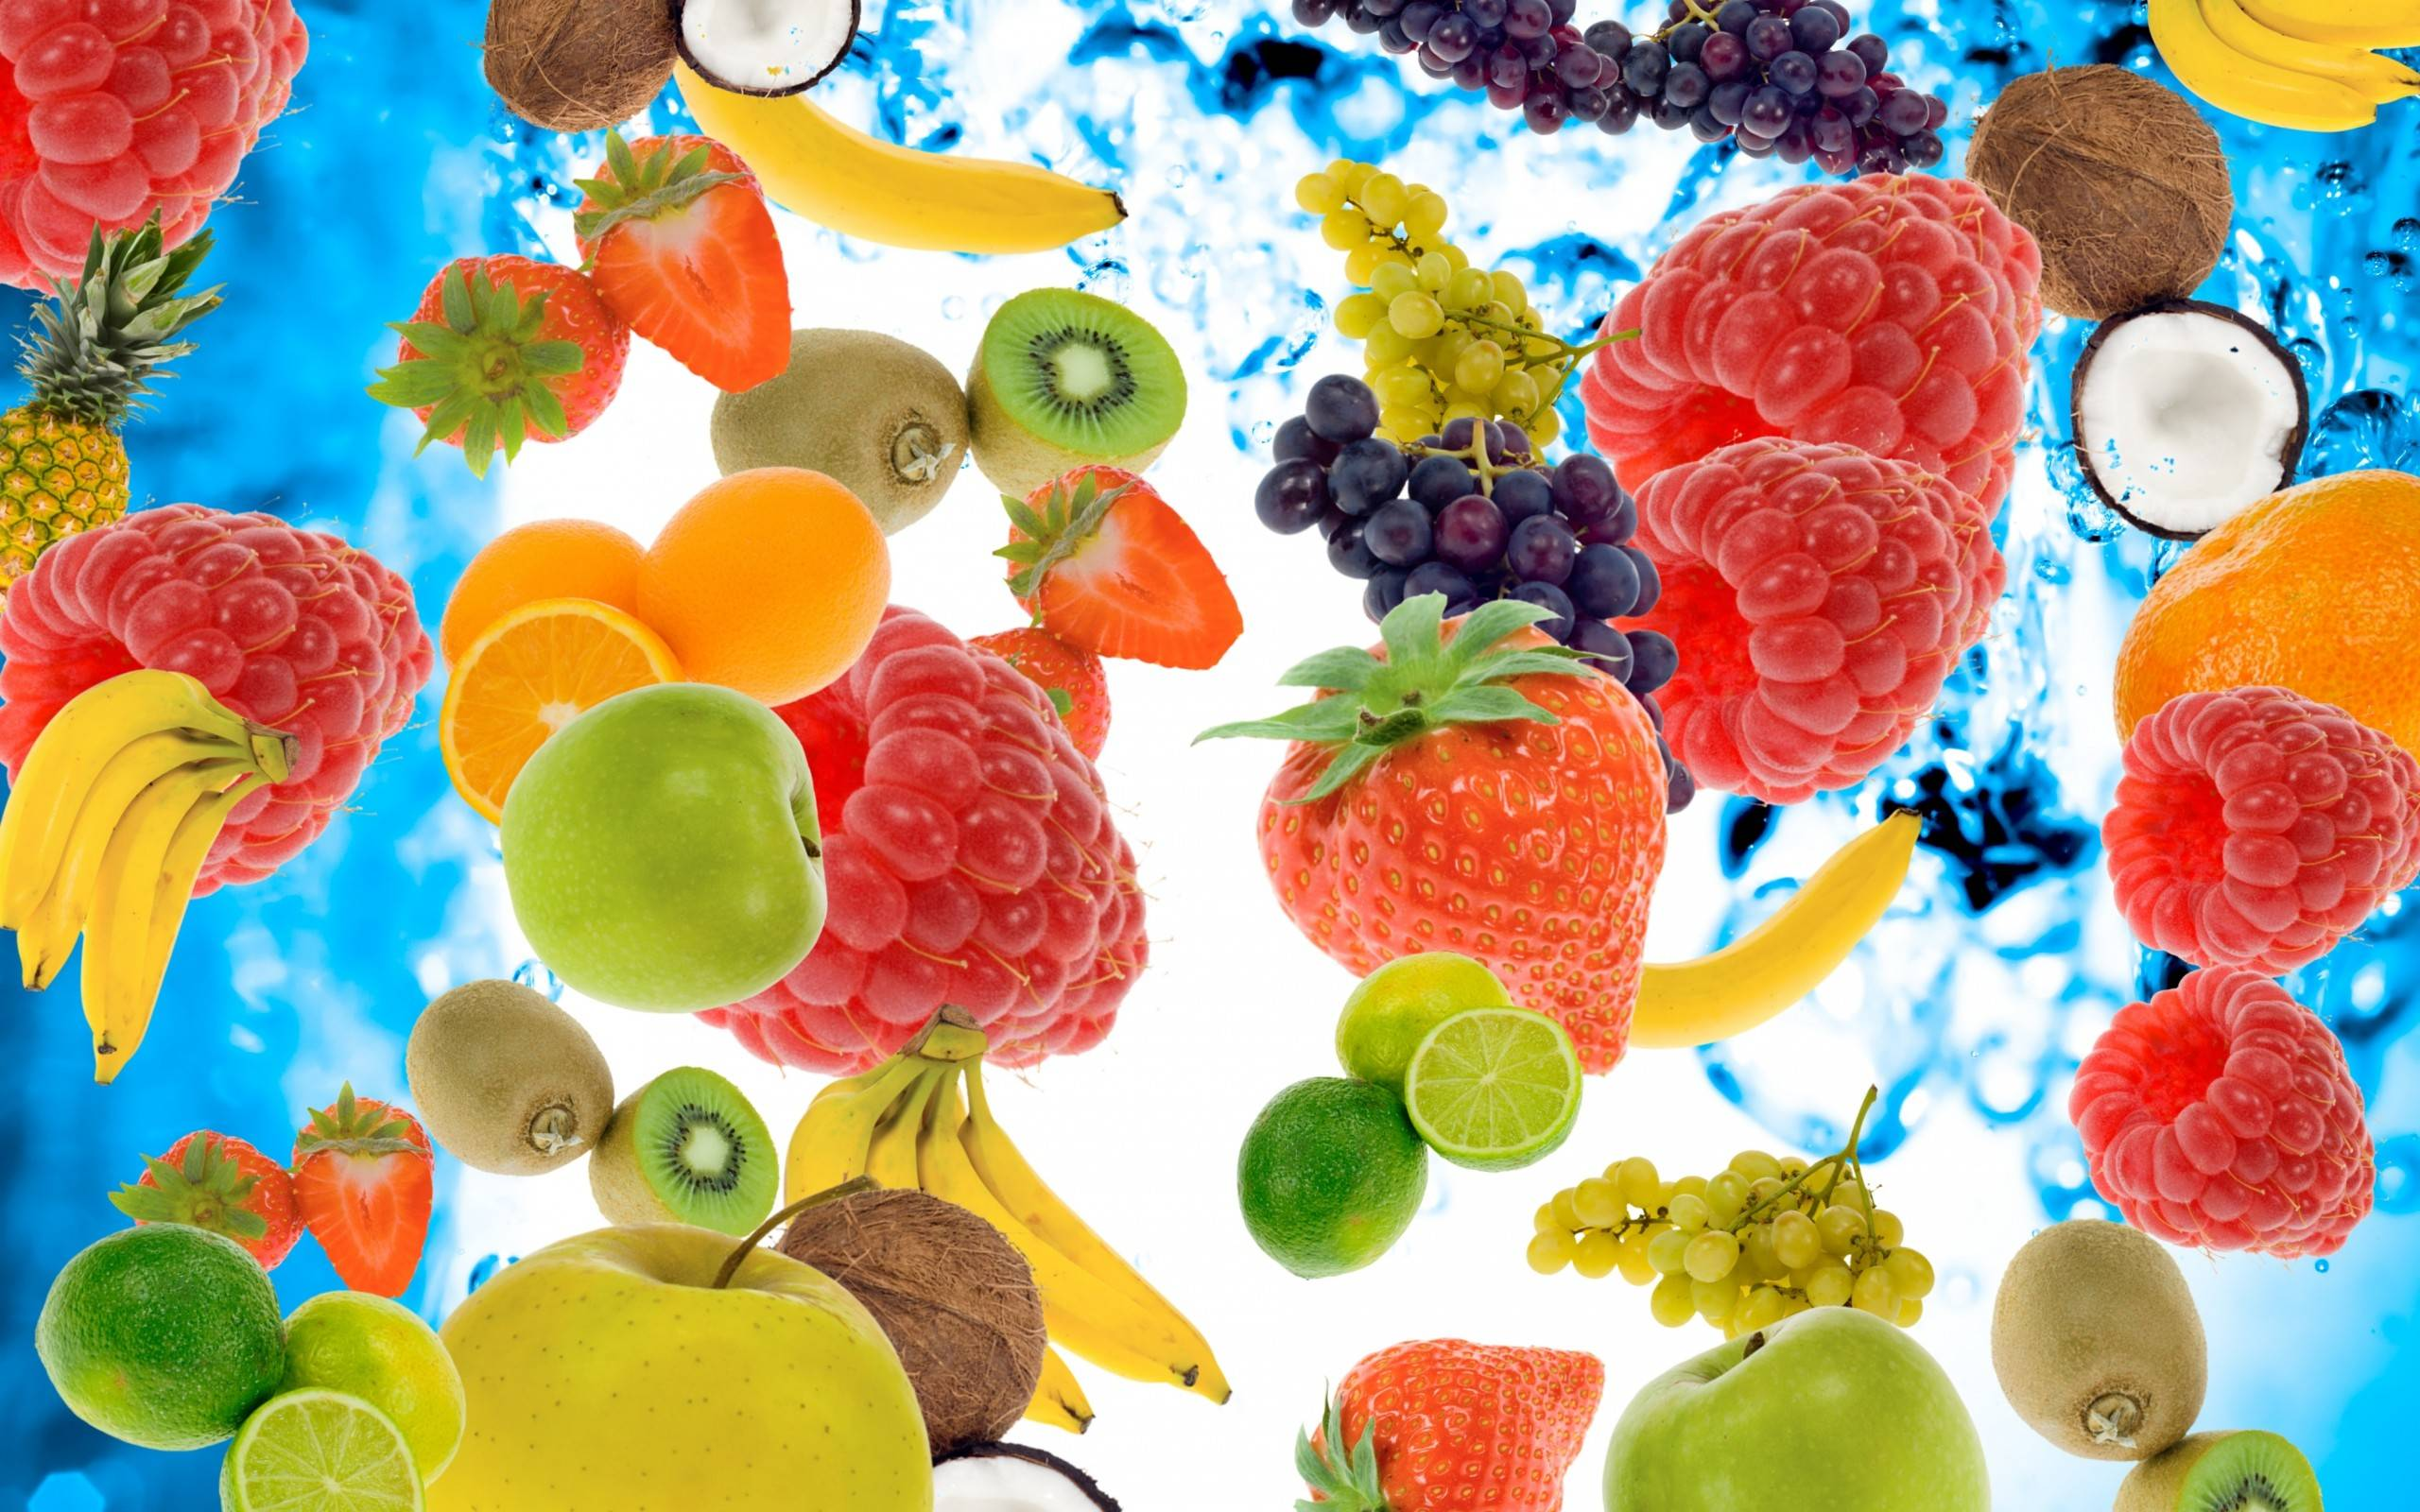 Fruit Wallpapers 2560x1600